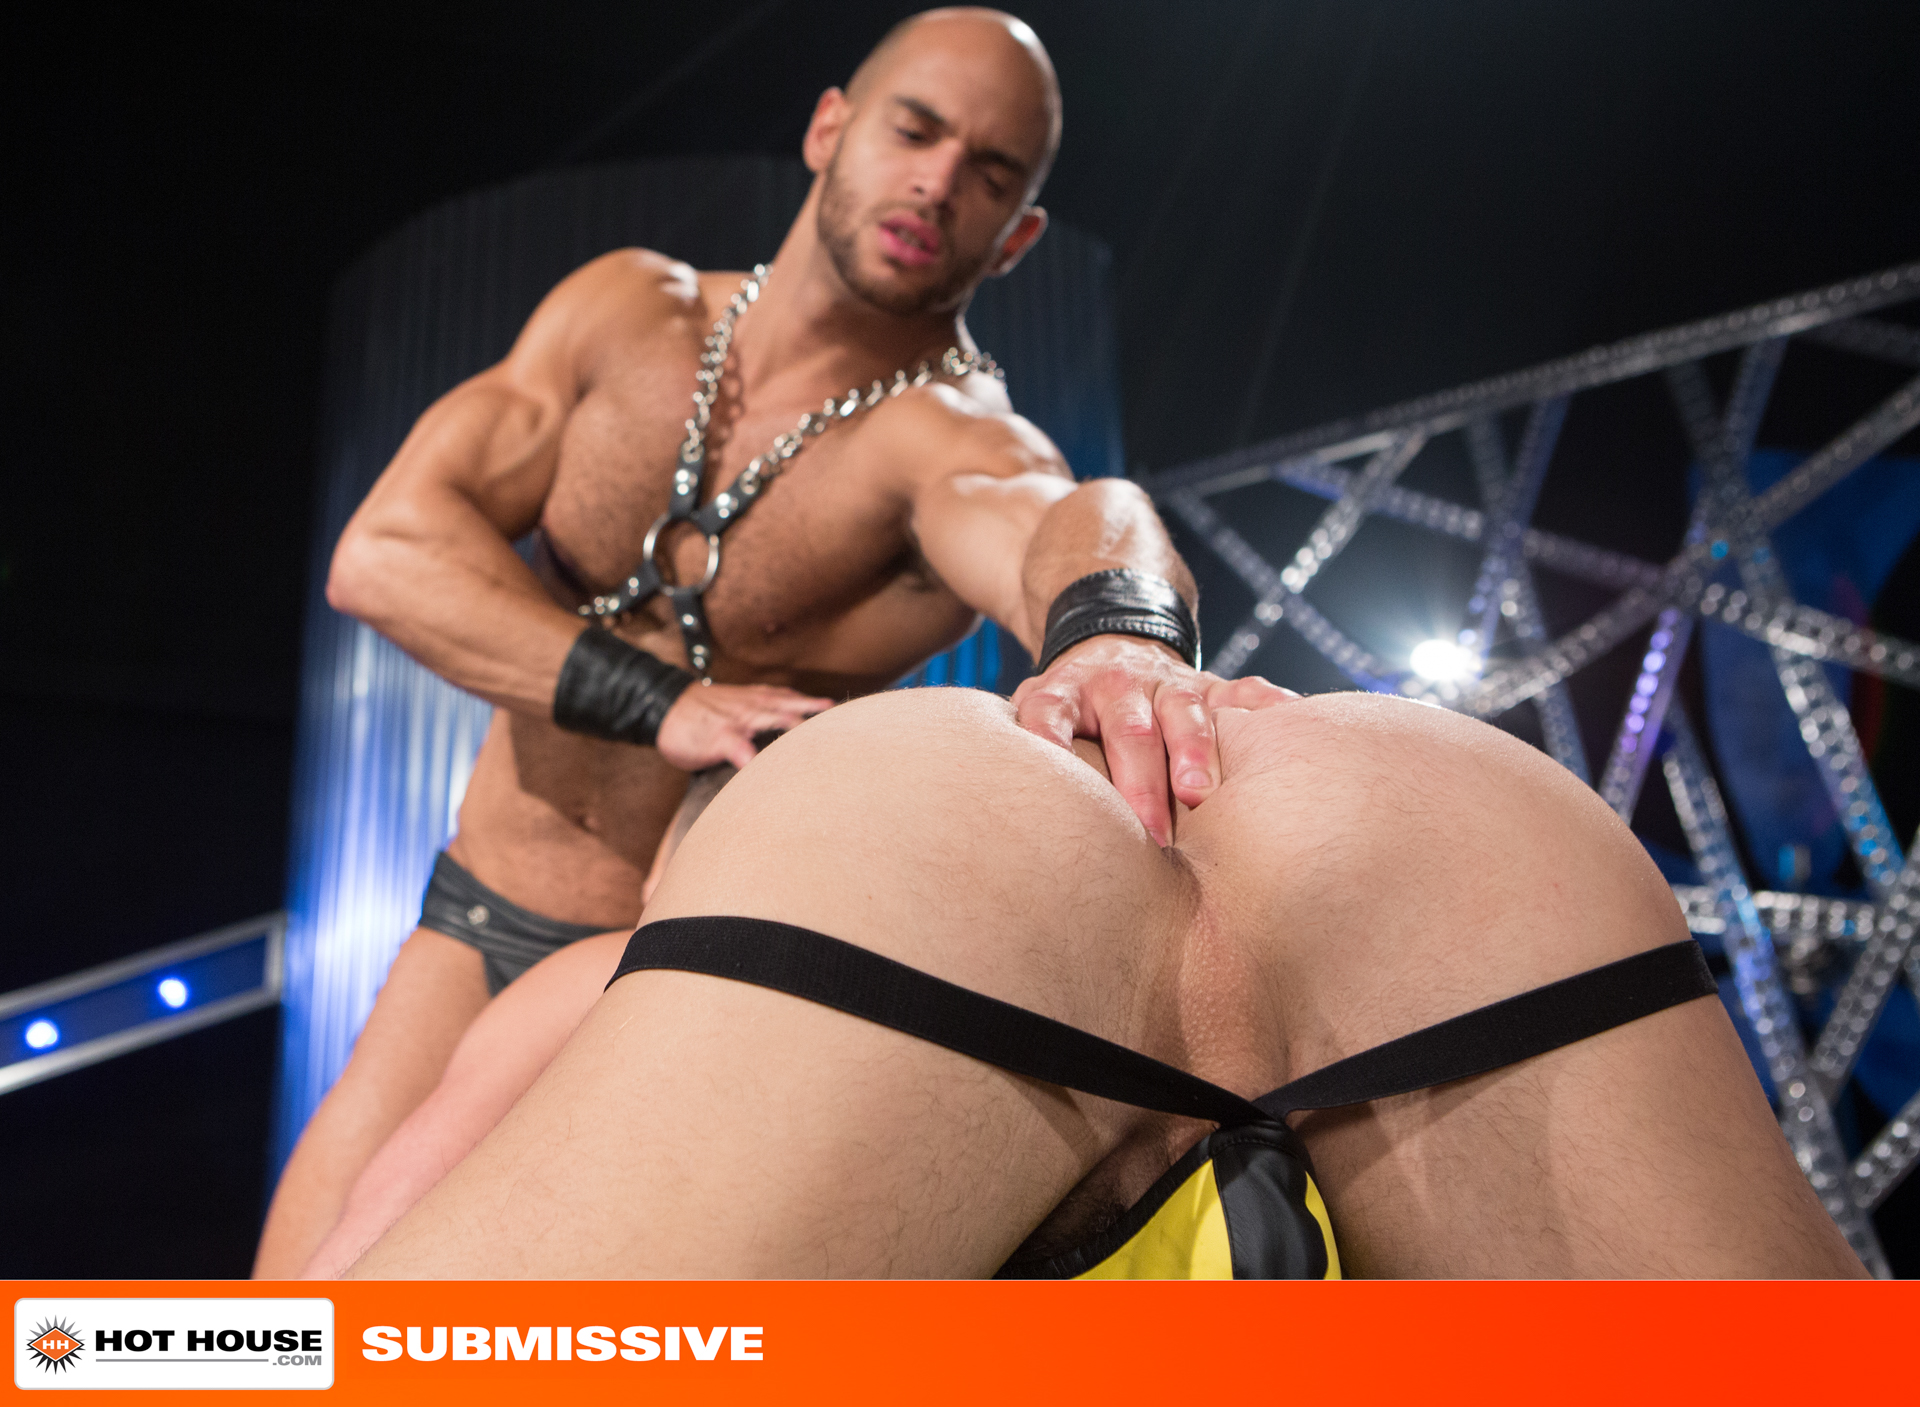 Andrea Suarez Gay Porn Xvideos andrea suarez gay